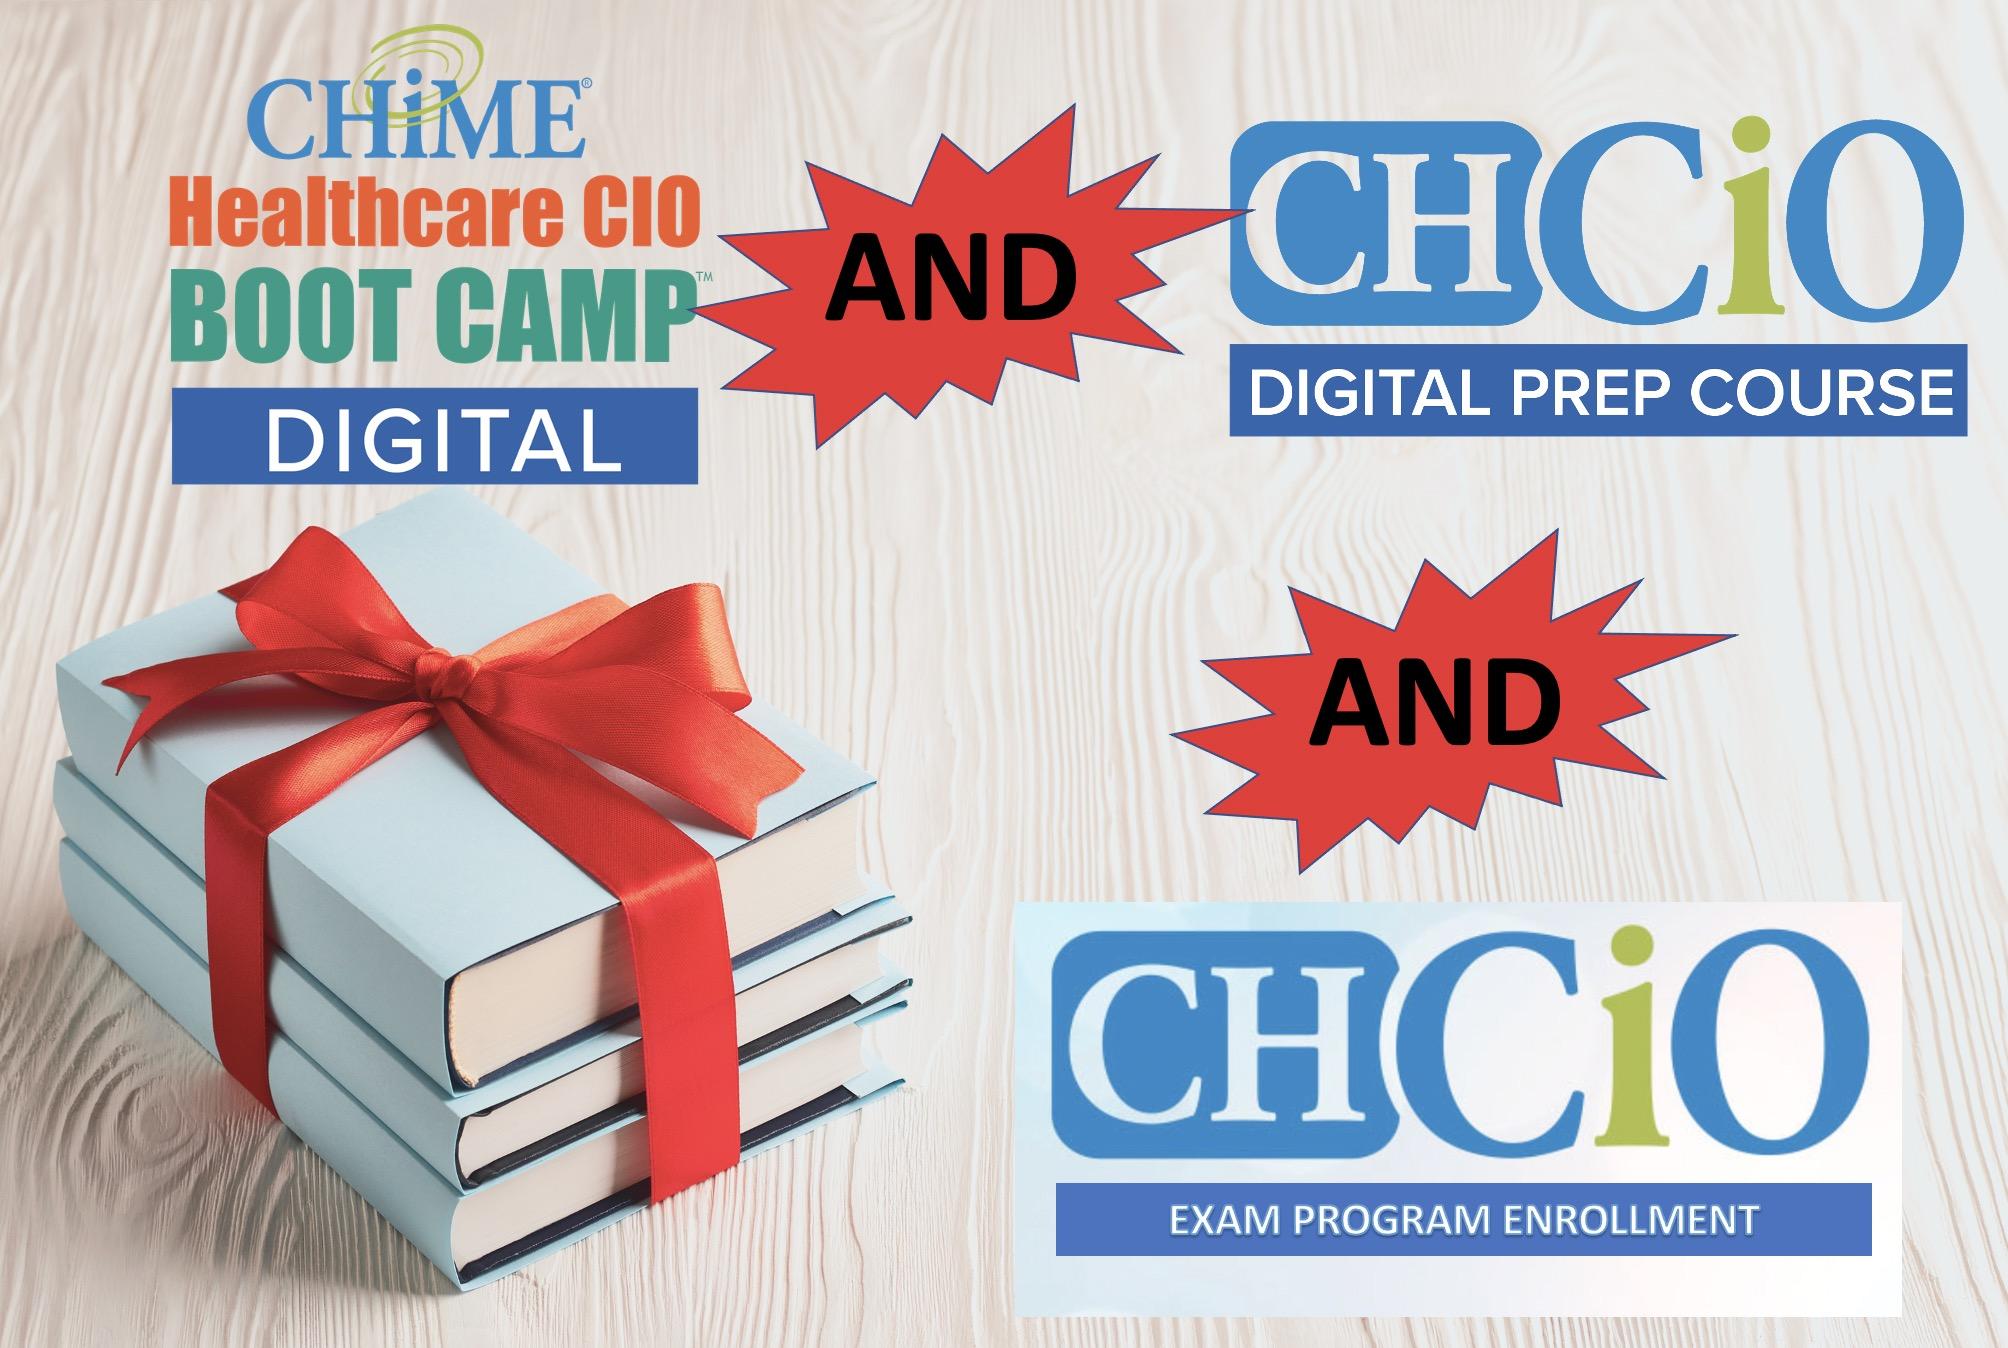 CHIME Healthcare CIO Boot Camp - Digital AND CHCIO Digital Prep Course AND CHCIO Program Enrollment